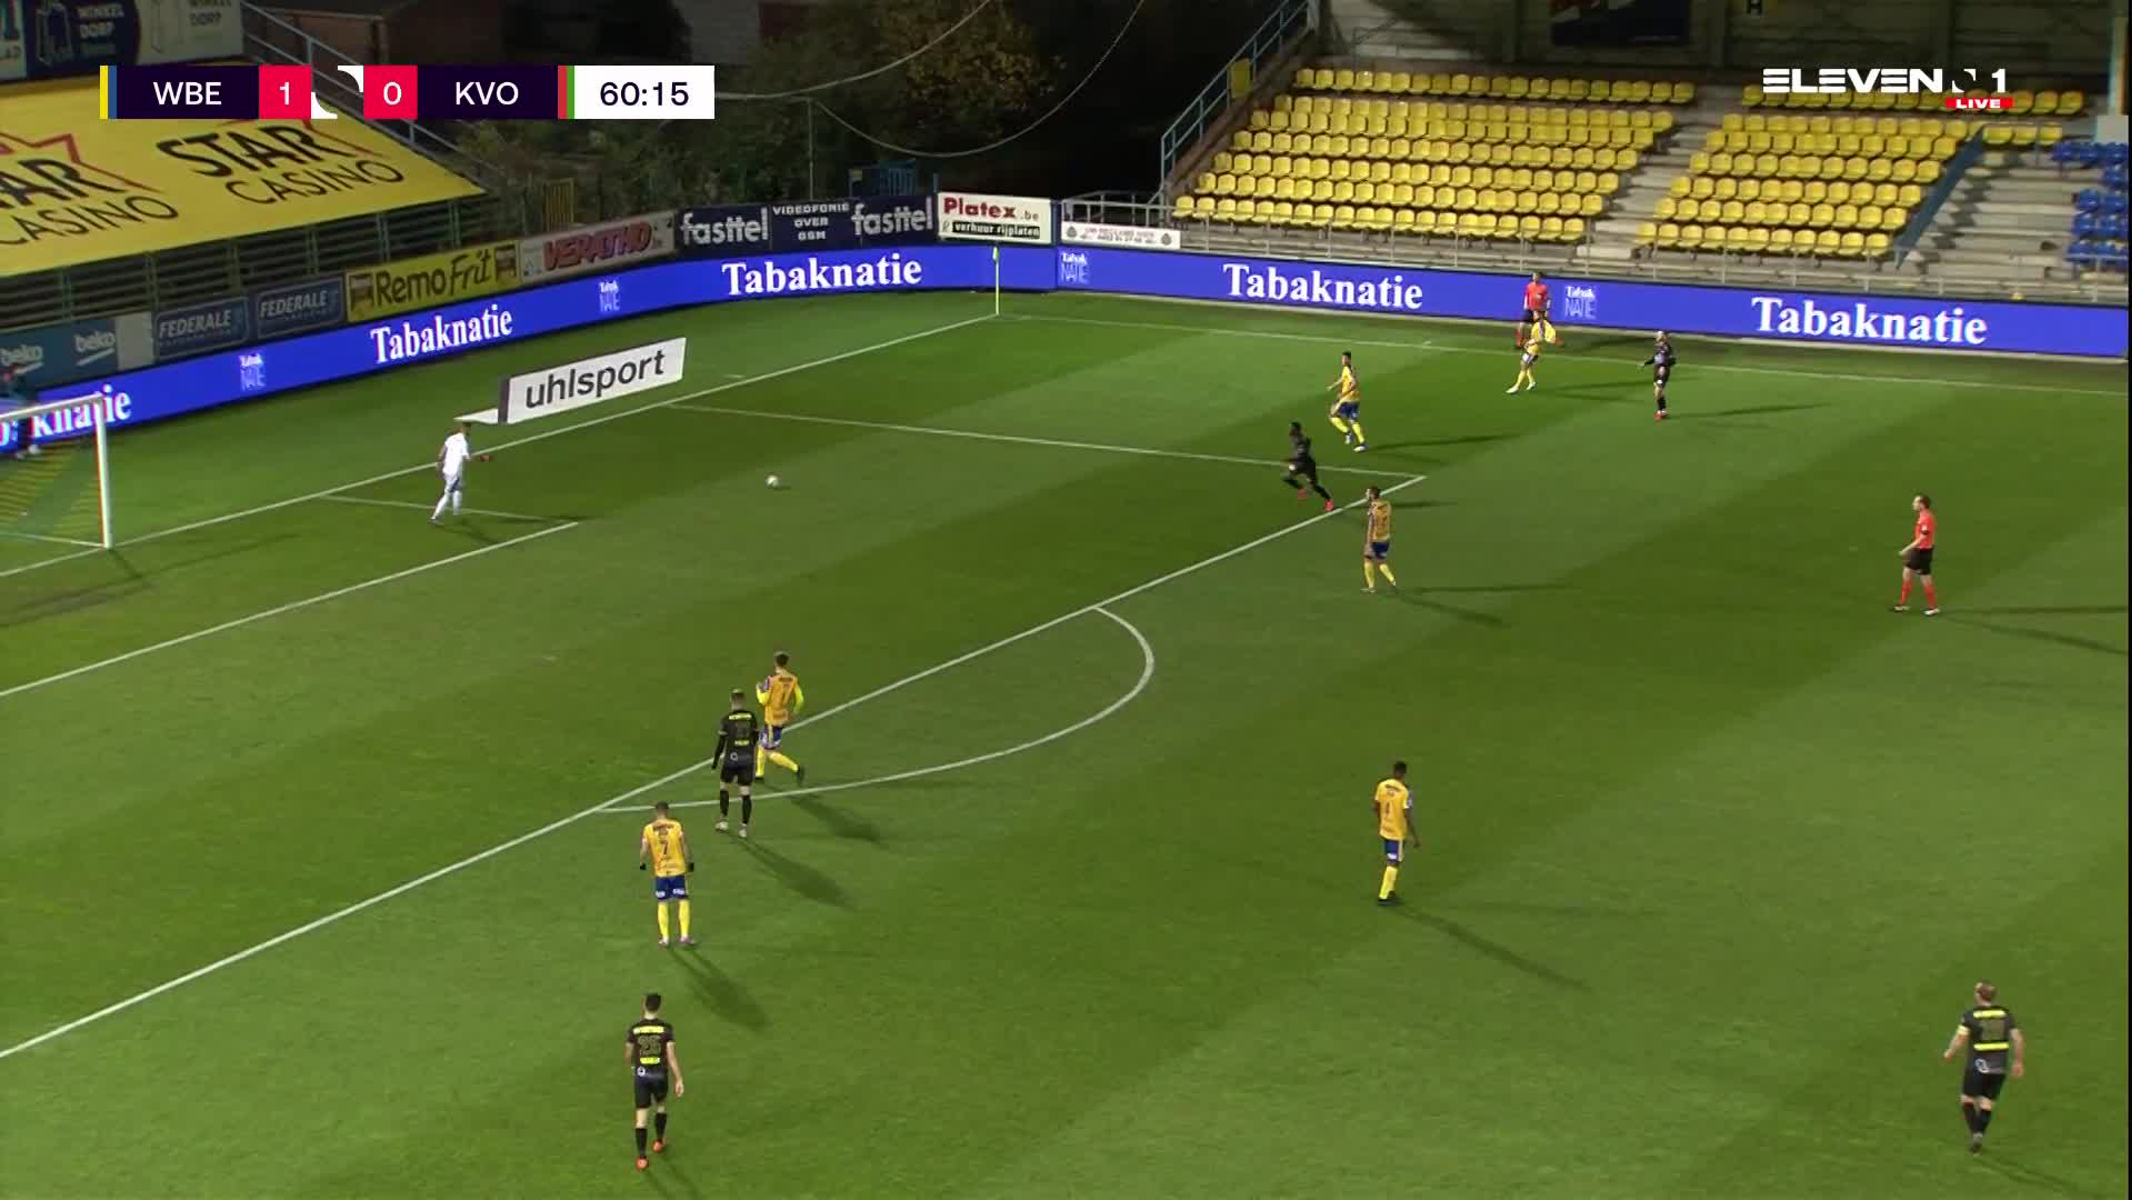 Doelpunt Danel Sinani (Waasland-Beveren vs. KV Oostende)